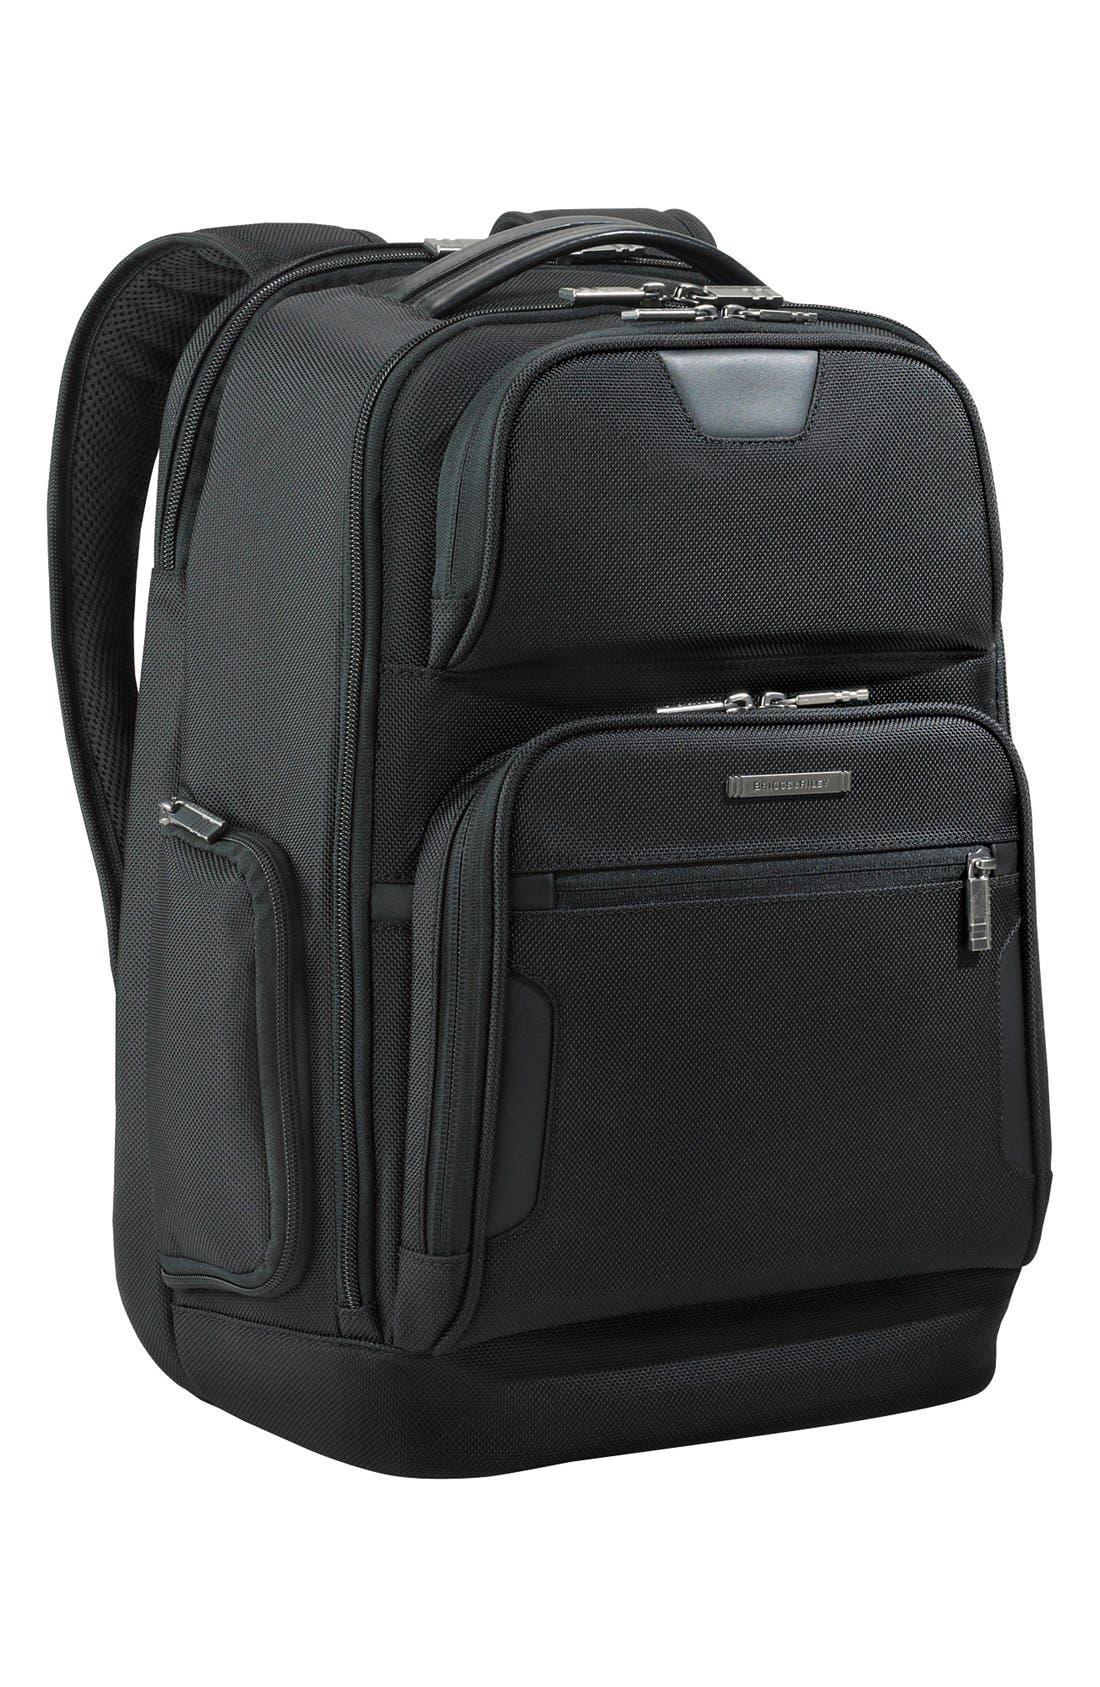 Alternate Image 1 Selected - Briggs & Riley 'Medium' Ballistic Nylon Backpack